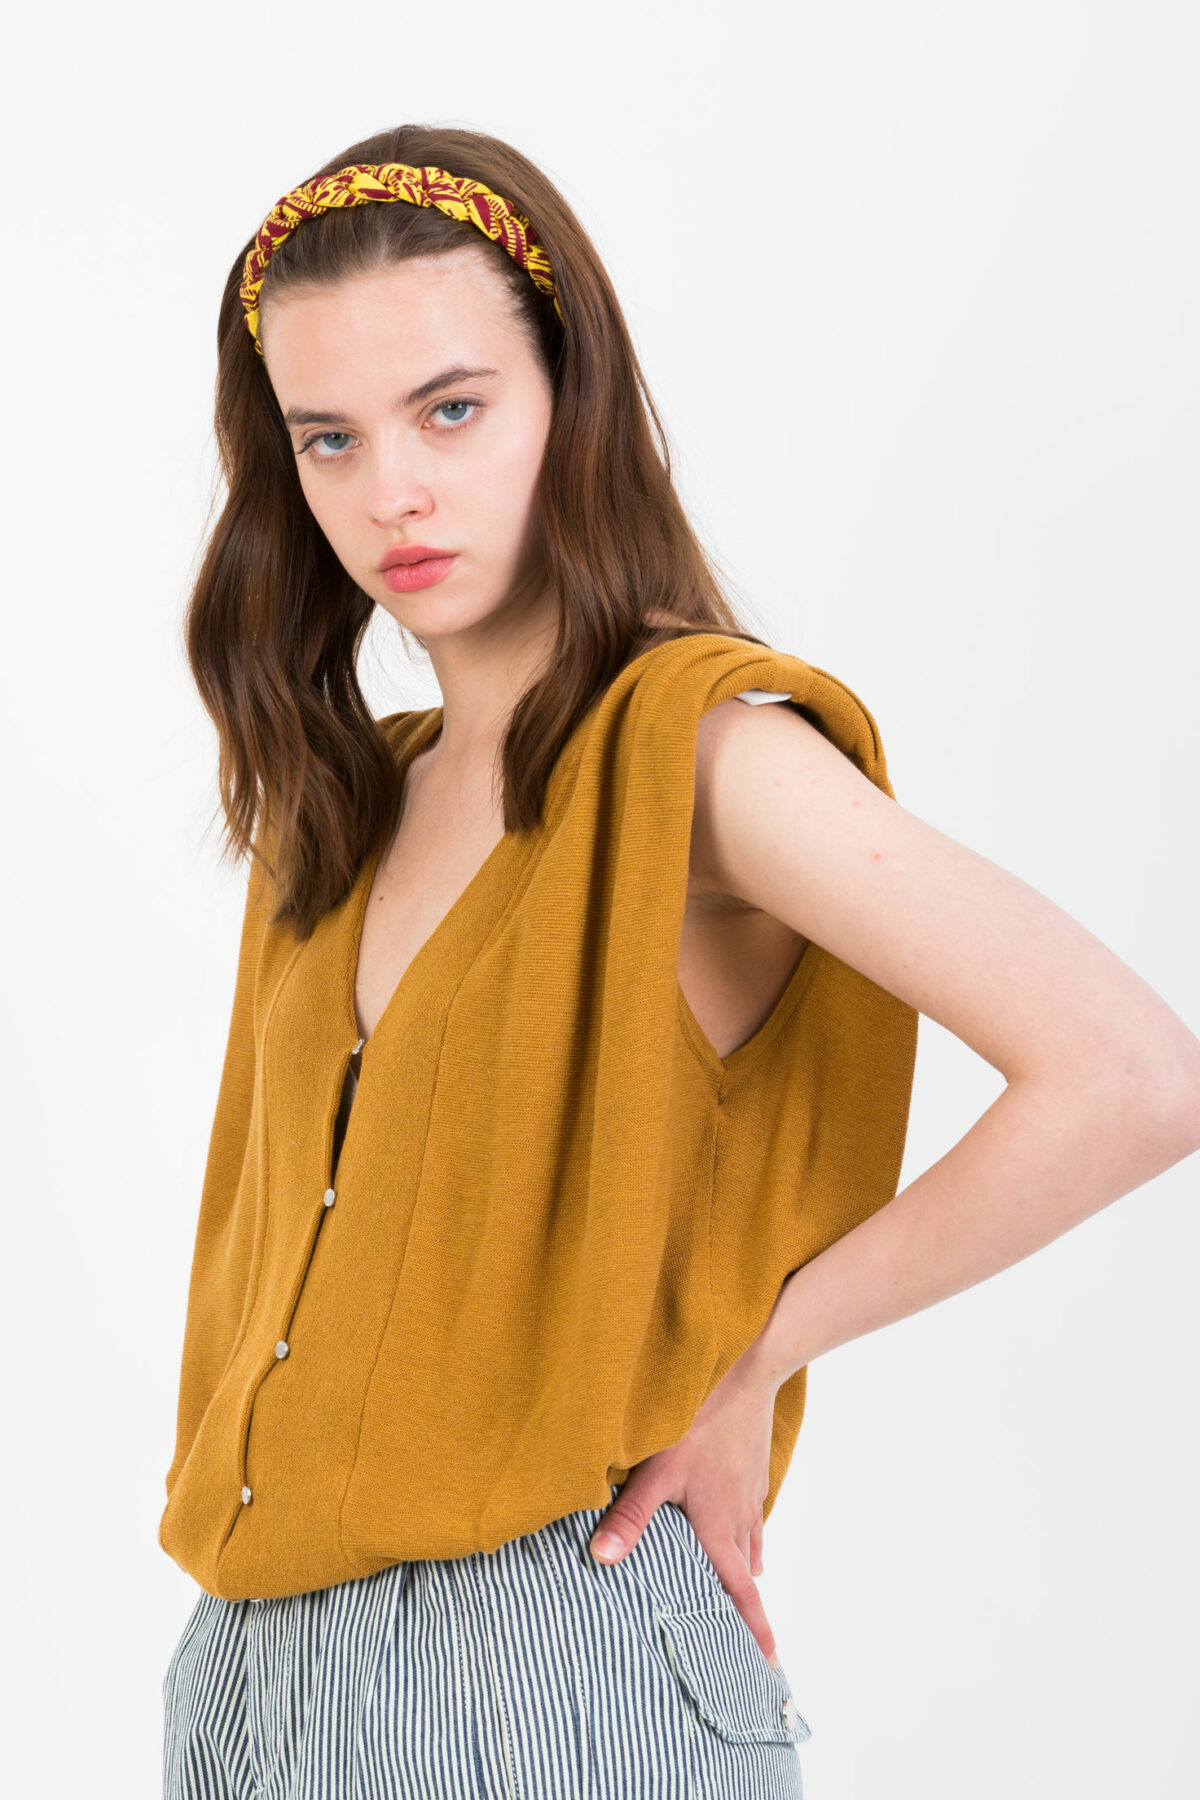 lony-bronze-knit-top-vamp-shoulders-bash-matchbxoathens